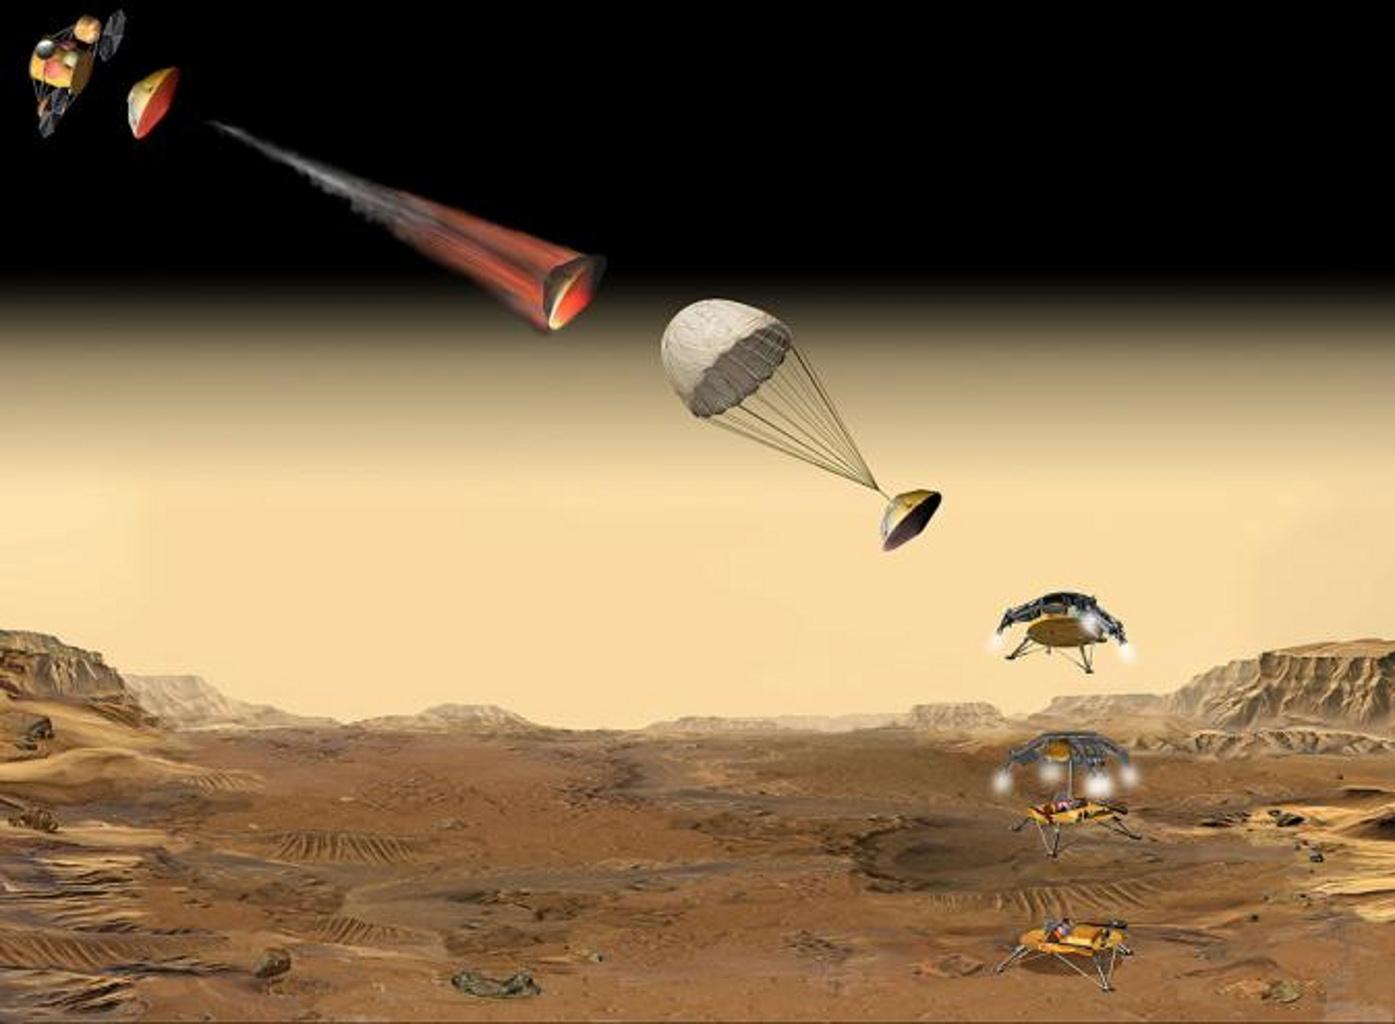 nasa spacecraft lands on mars - photo #30